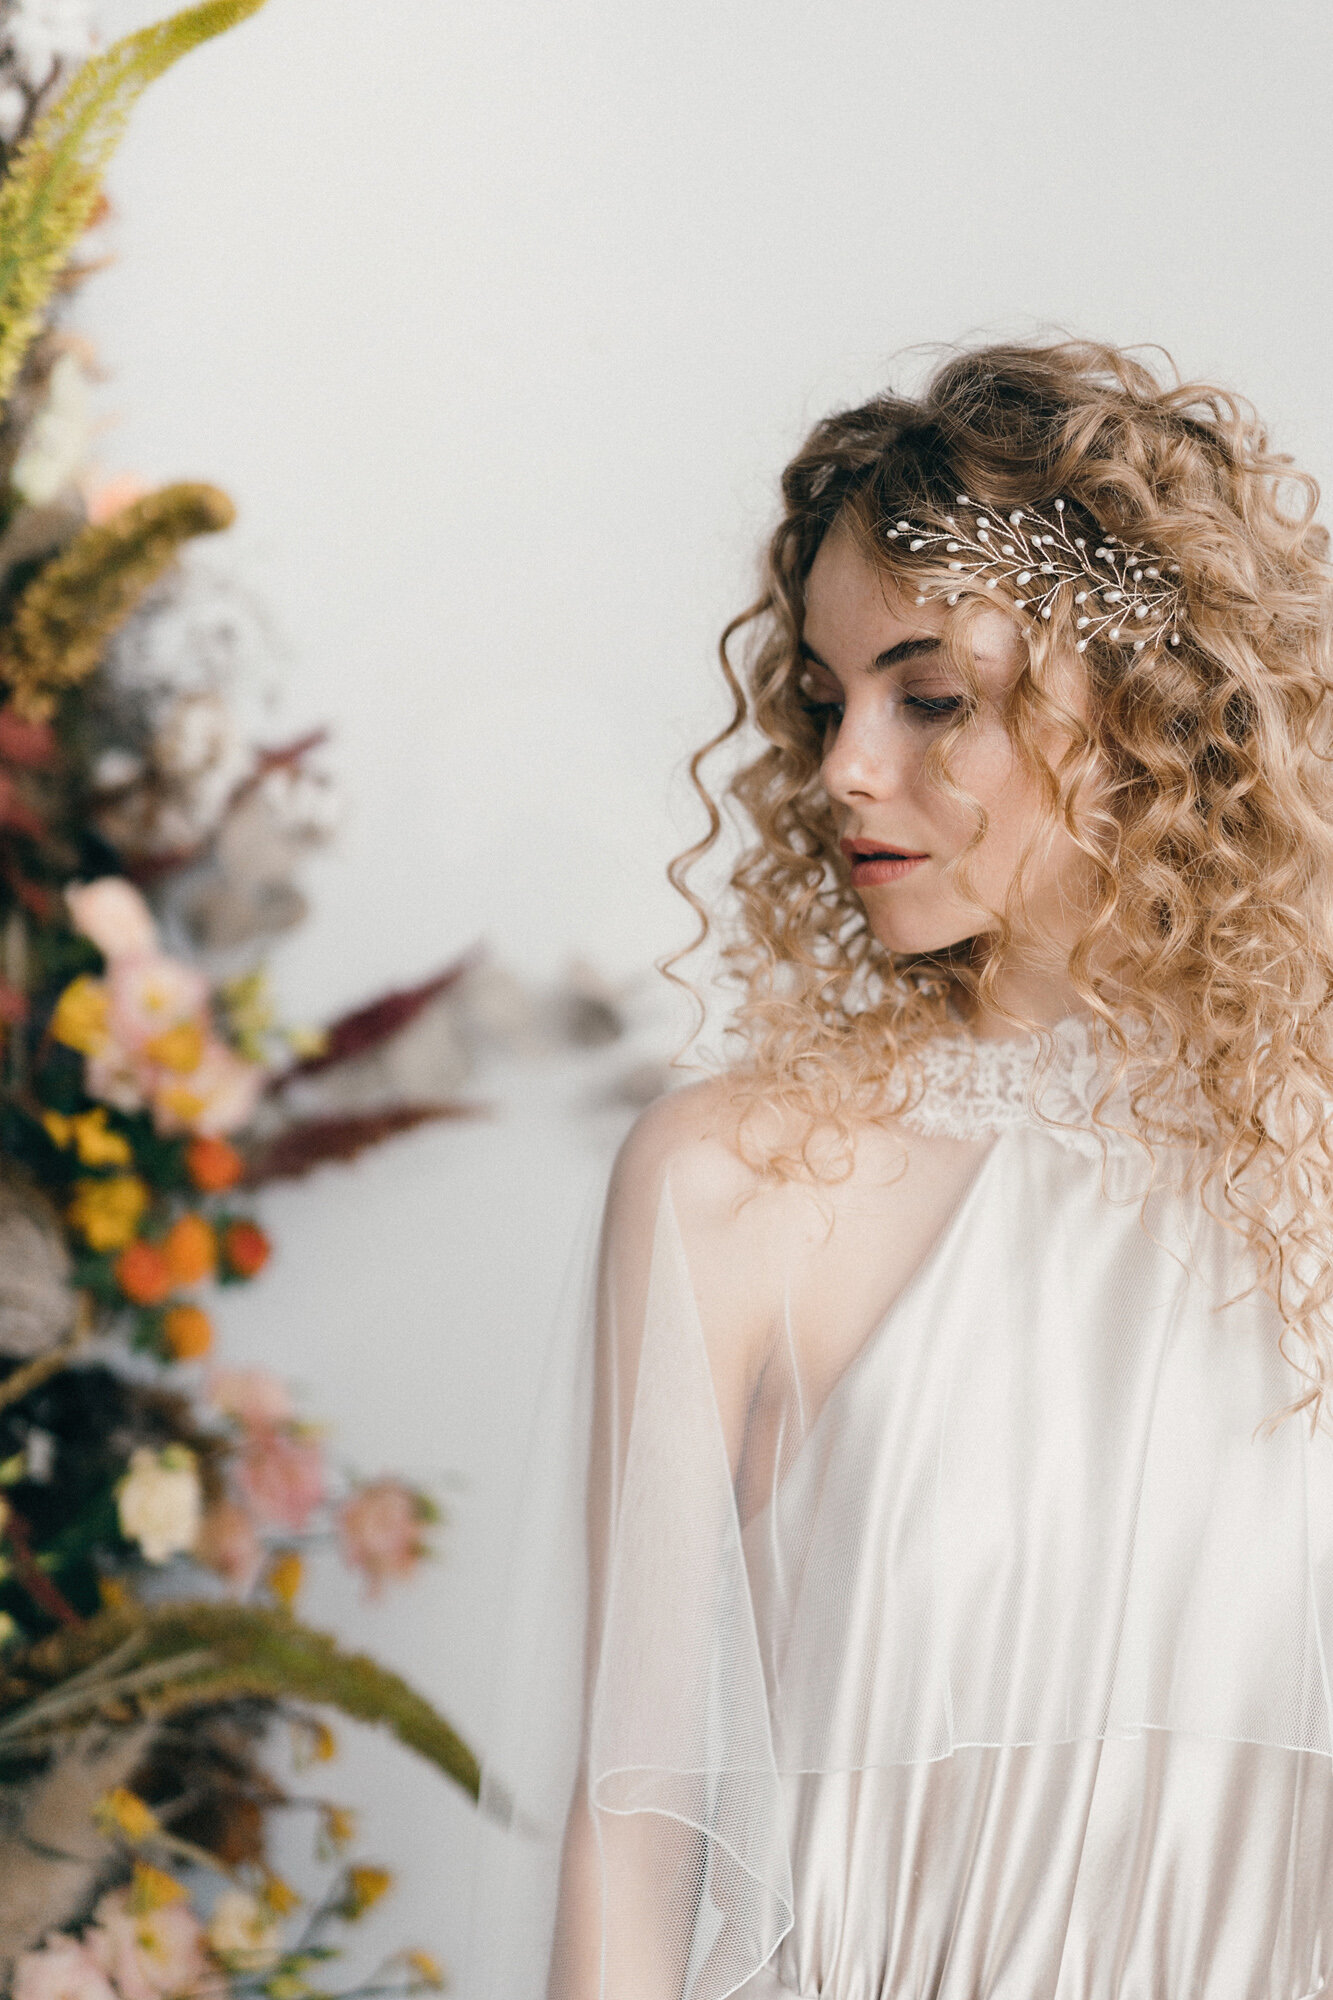 Debbie-Carlisle-Bridal-Accessories-Kate-Beaumont-Wedding-Gowns-Sheffield-Yorkshire-UK-14.jpg